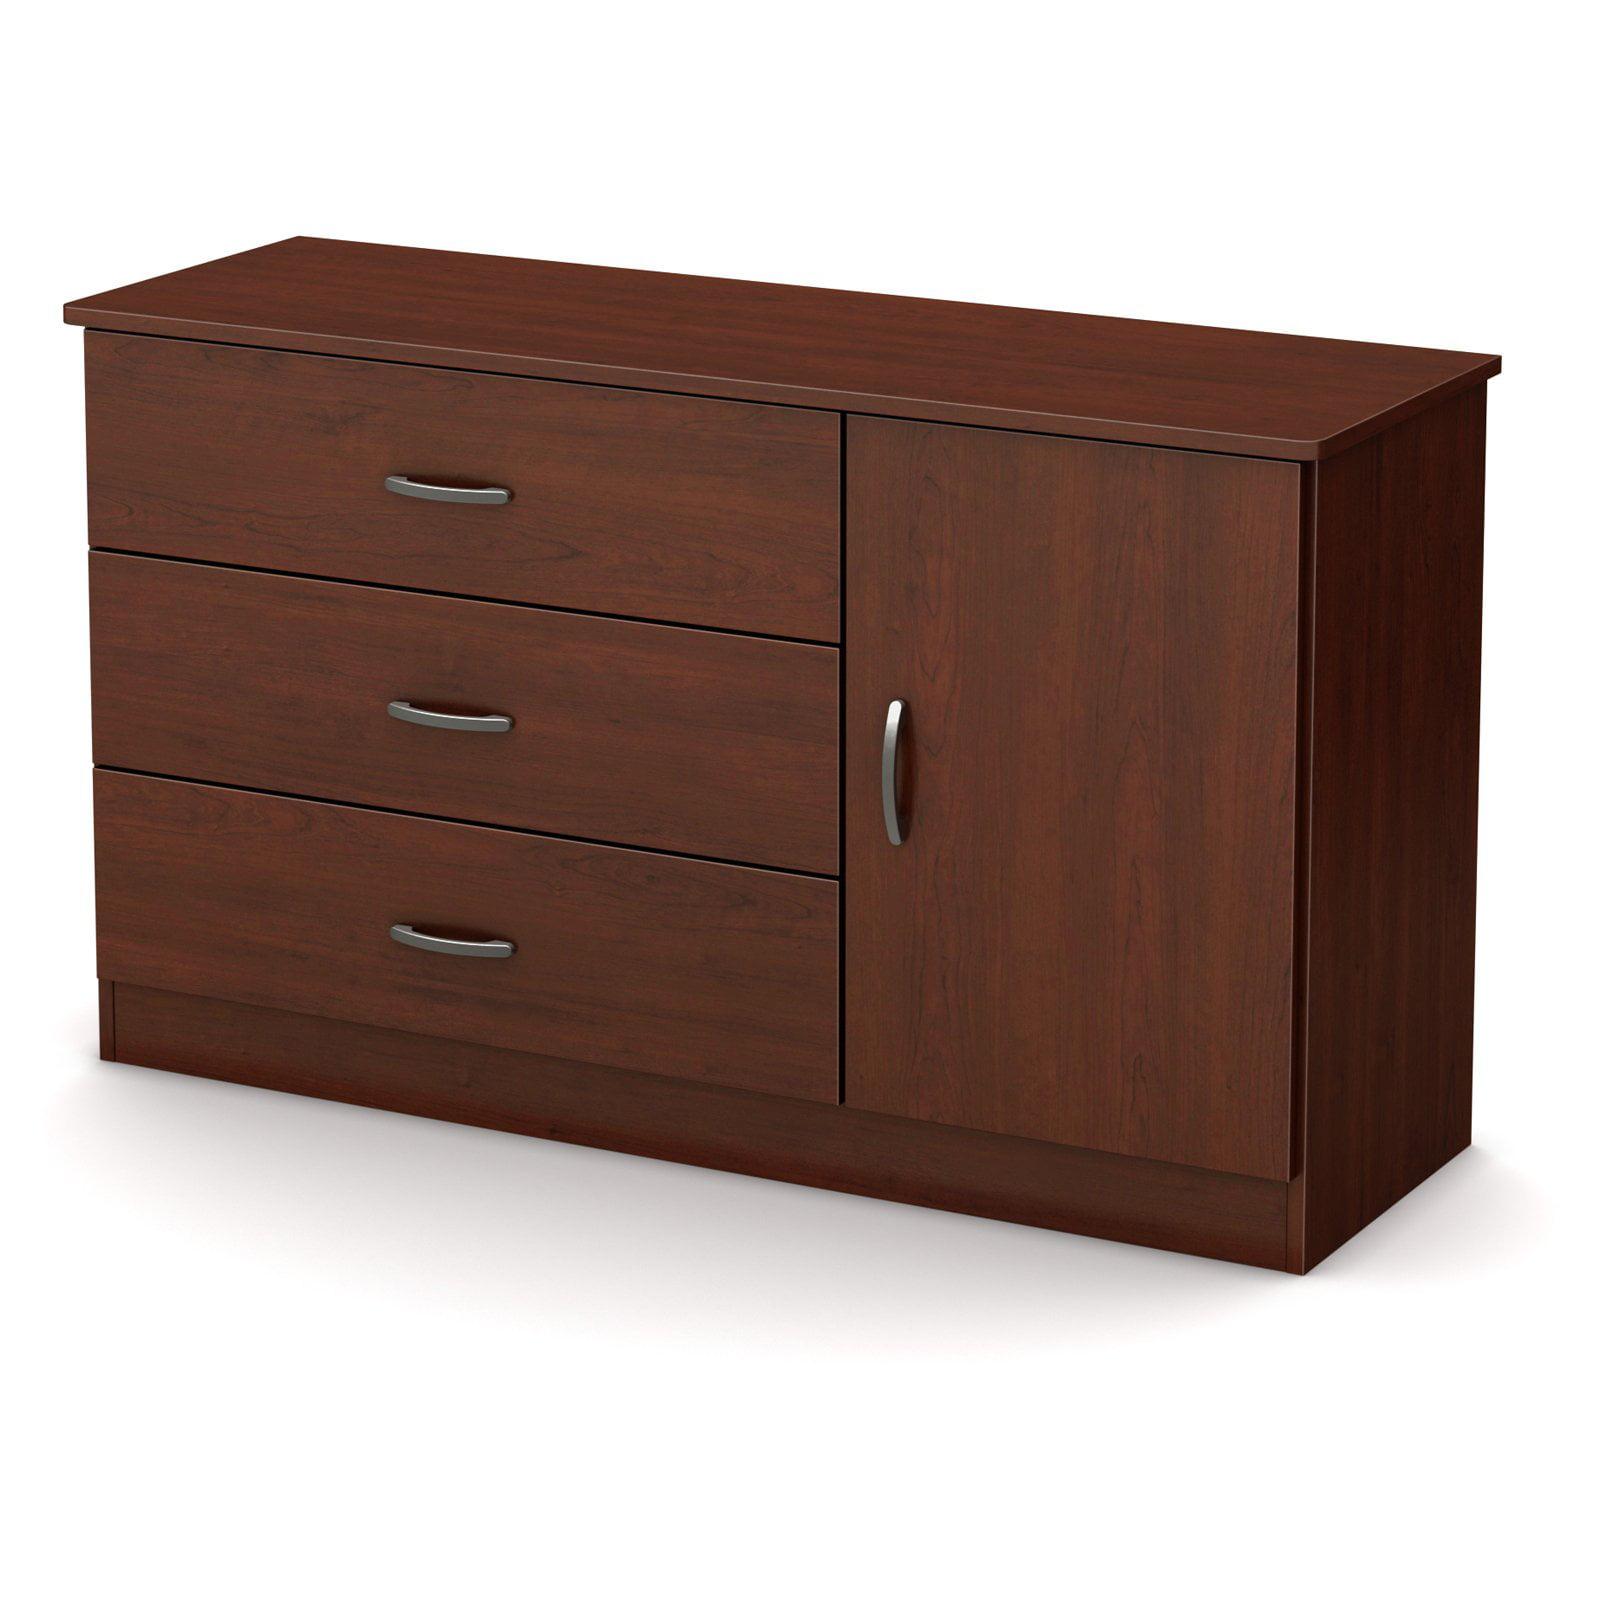 South Shore Smart Basics 3-Drawer Dresser with Door, Multiple Finishes